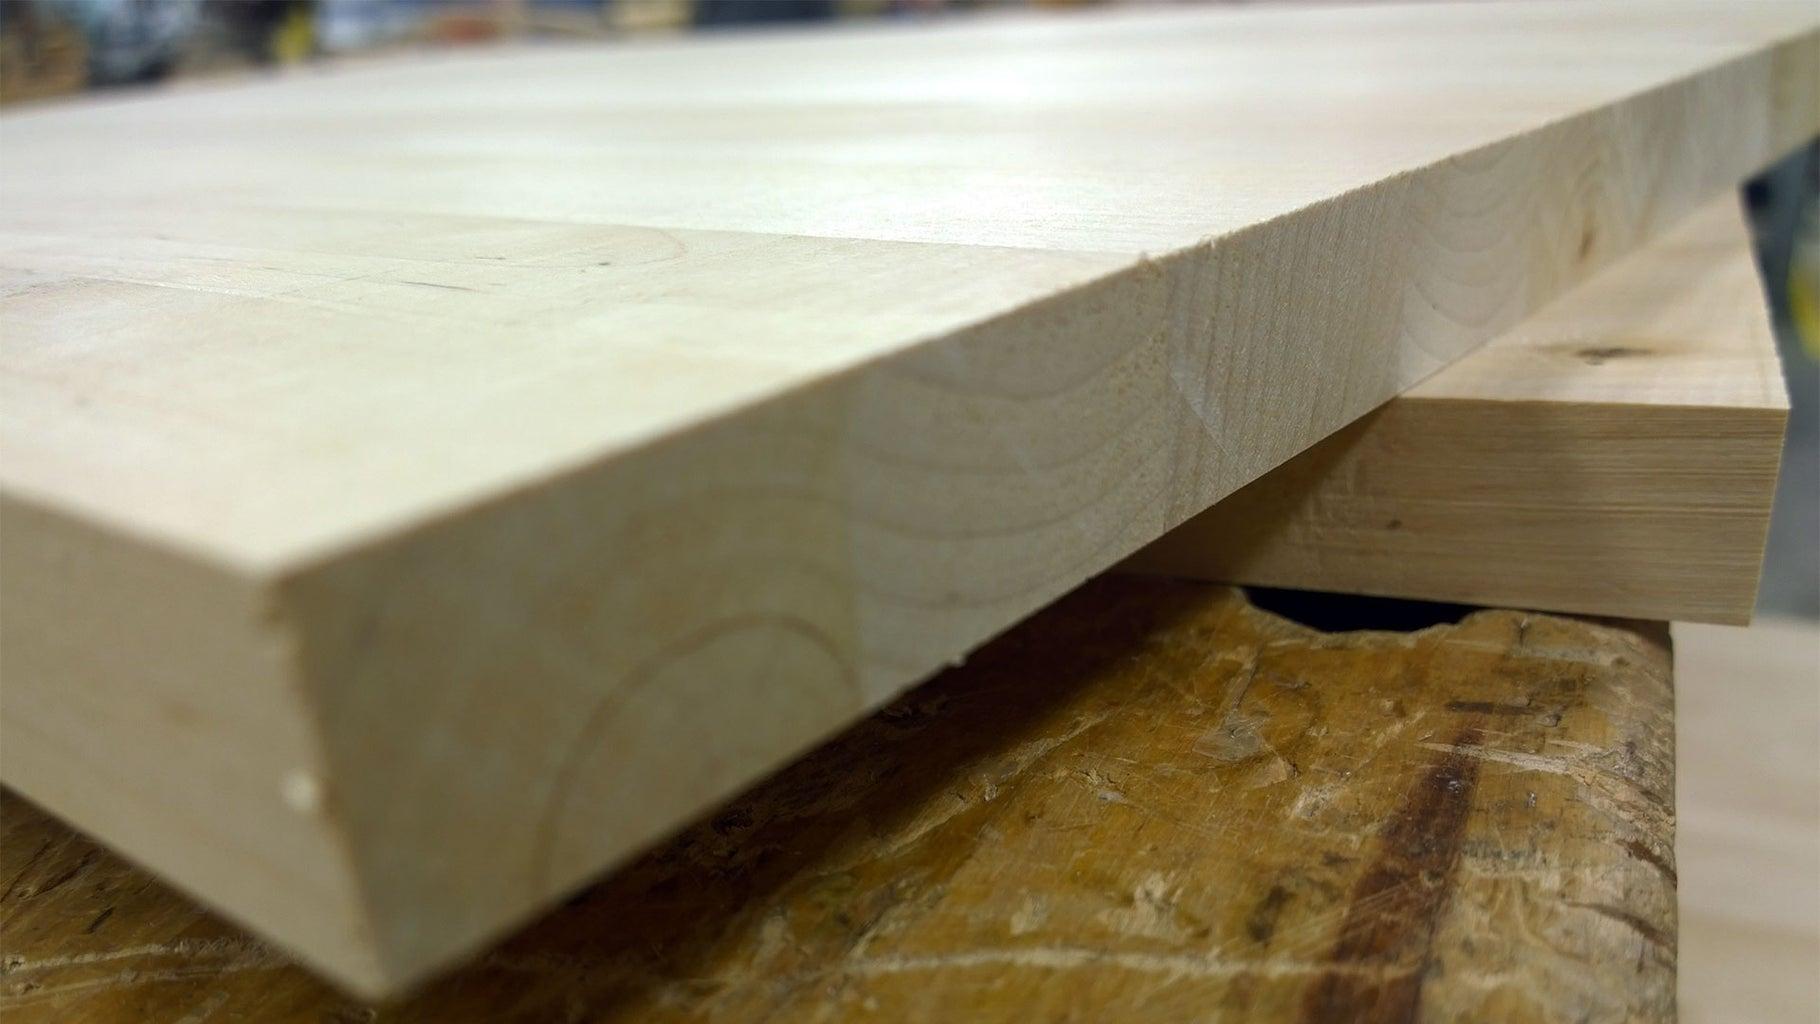 Preparing Boards